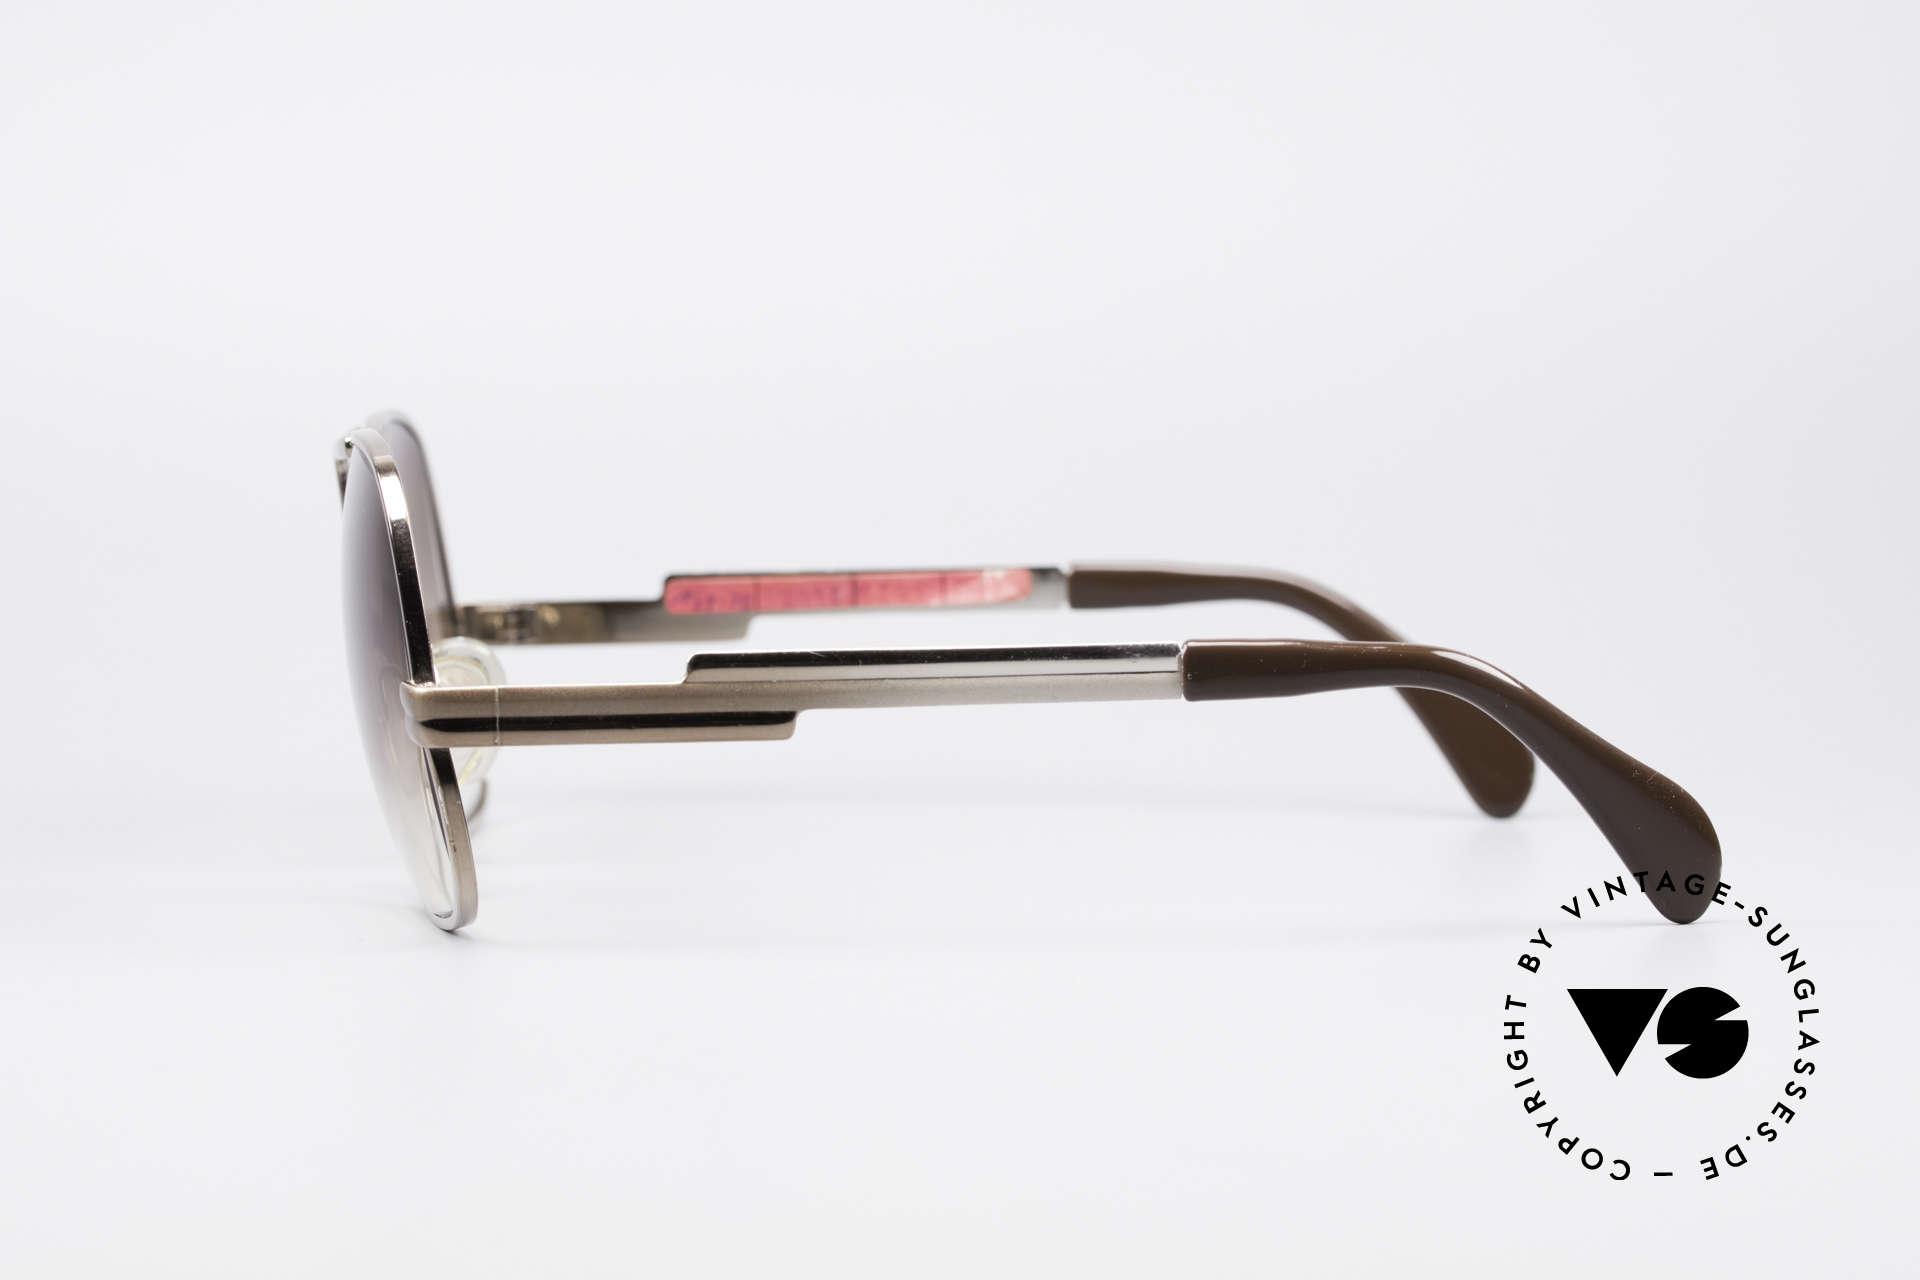 Cazal 701 Ultra Rare 70's Sunglasses, frame is made for lenses of any kind (optical / sun), Made for Men